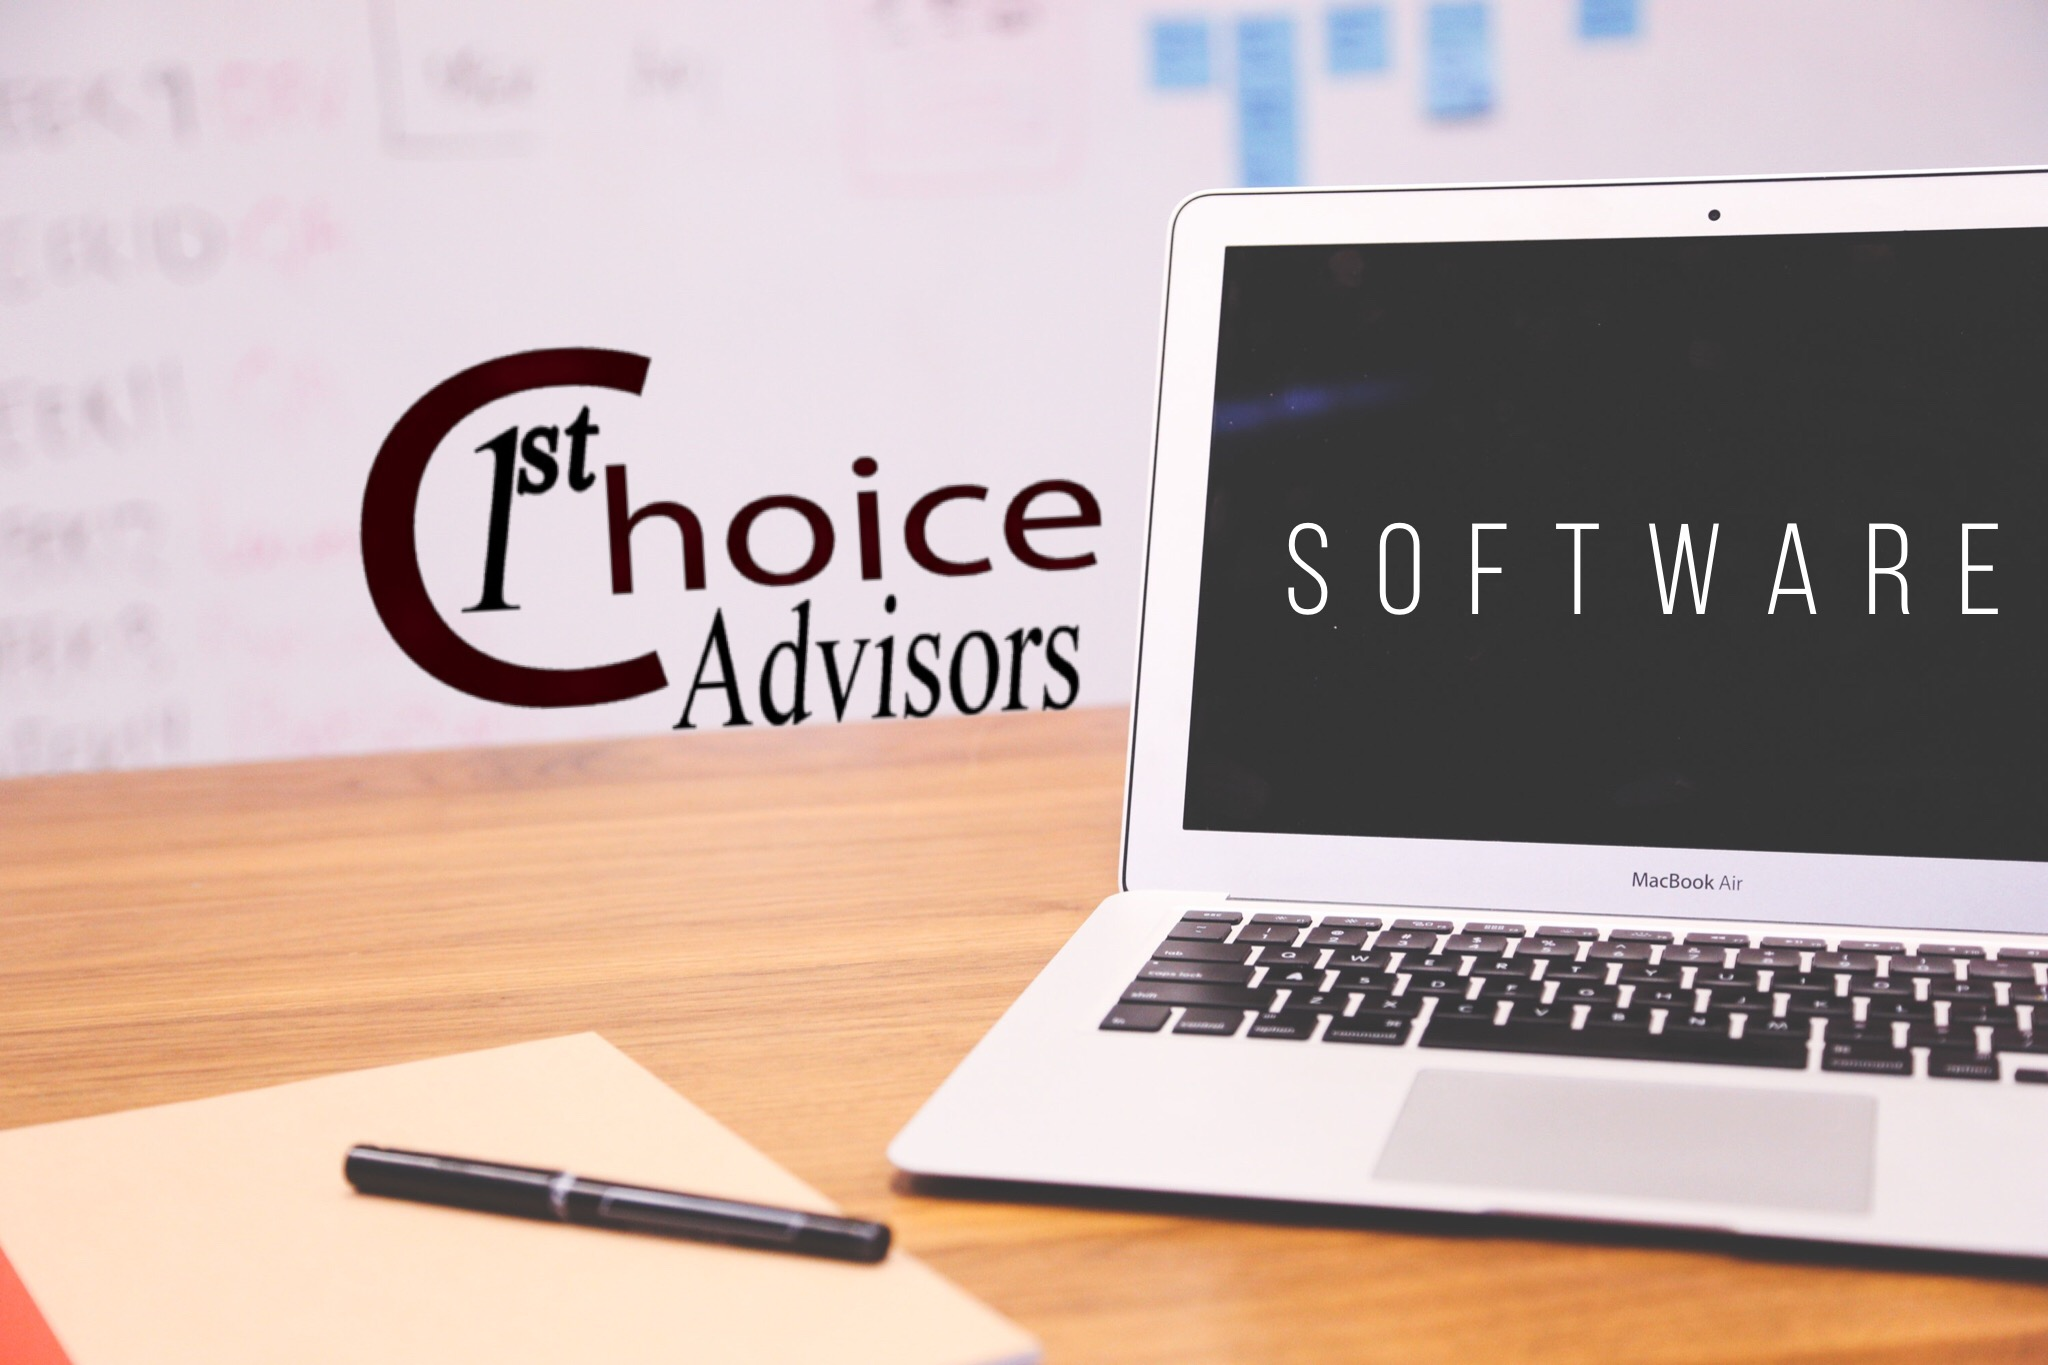 1st Choice Advisors Software